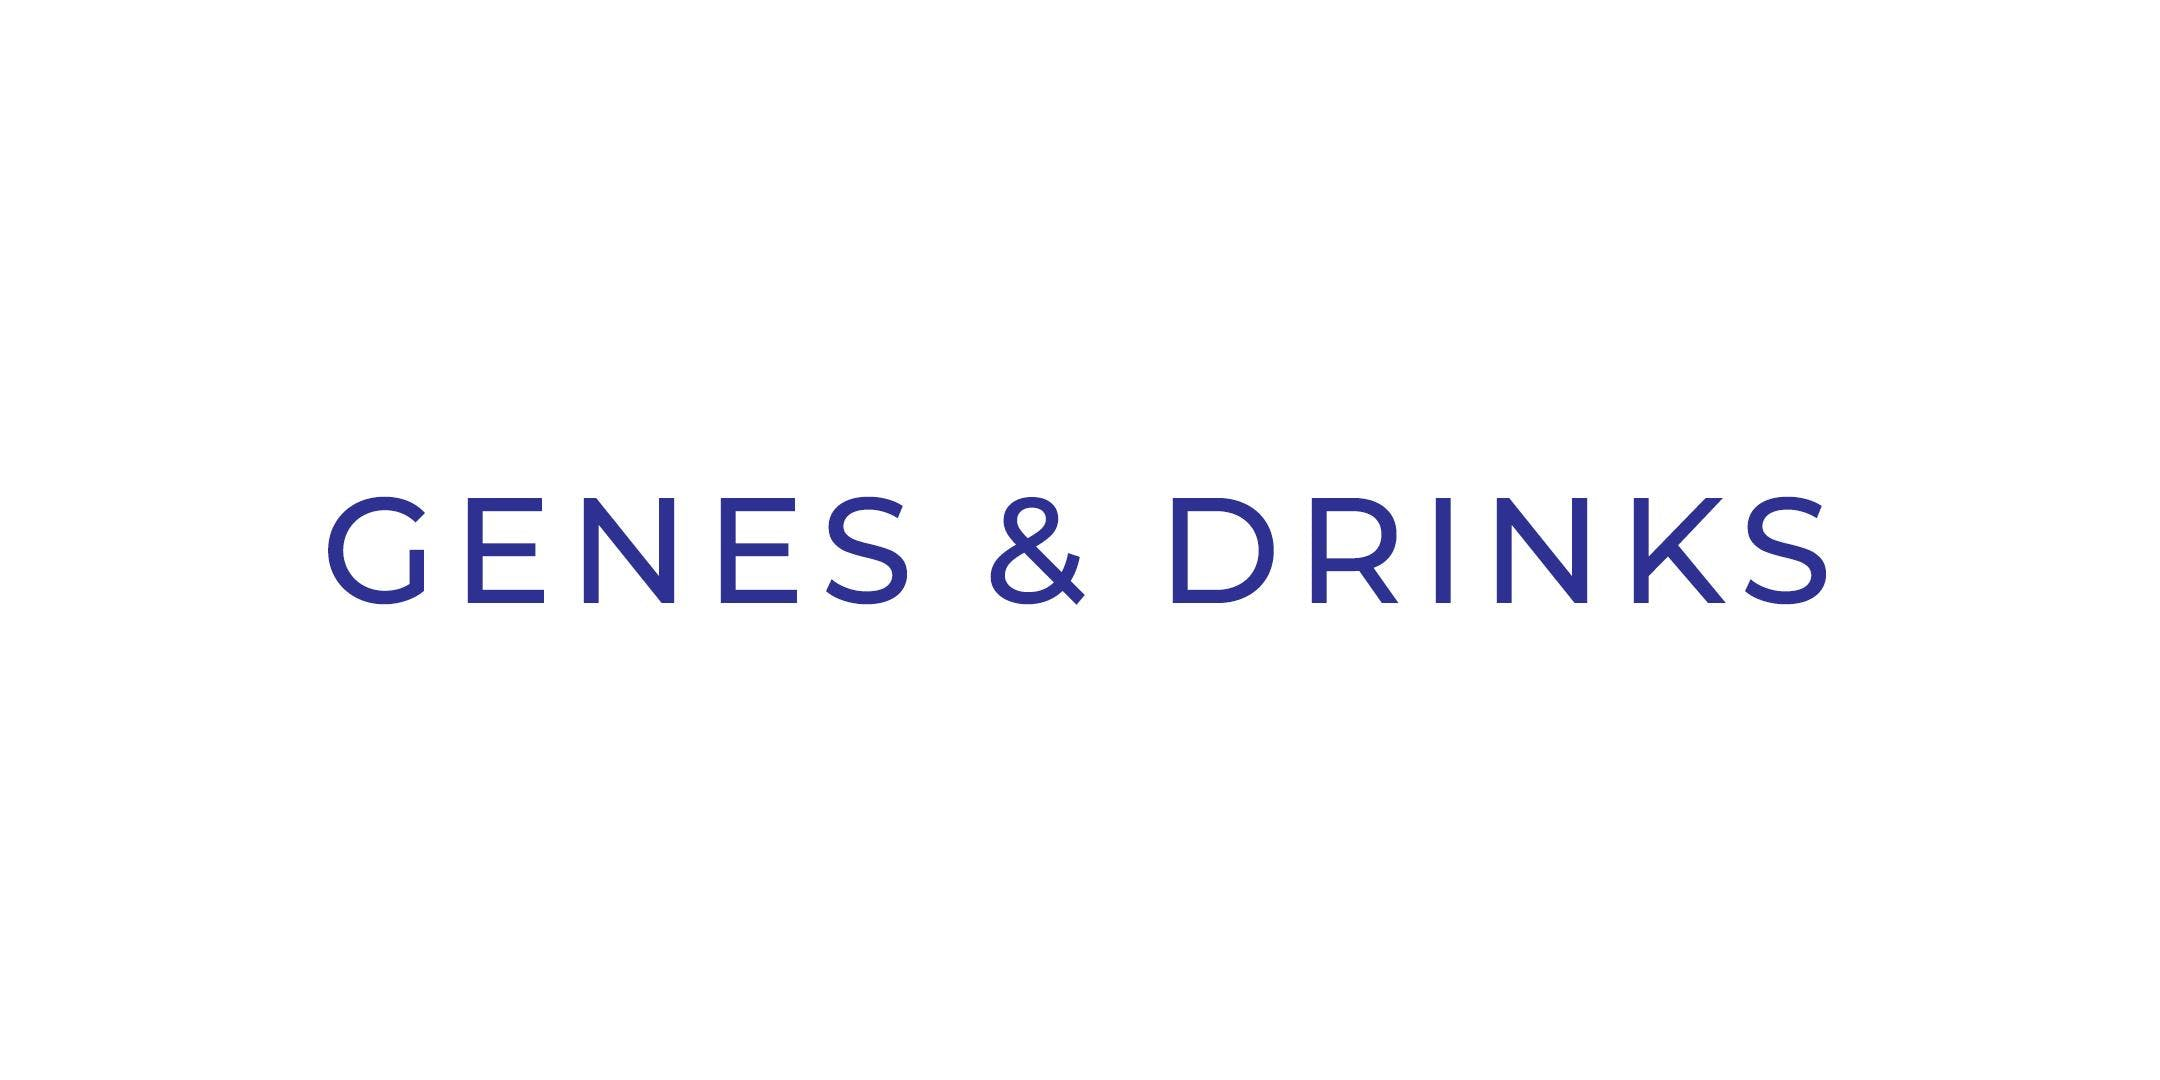 Genes & Drinks